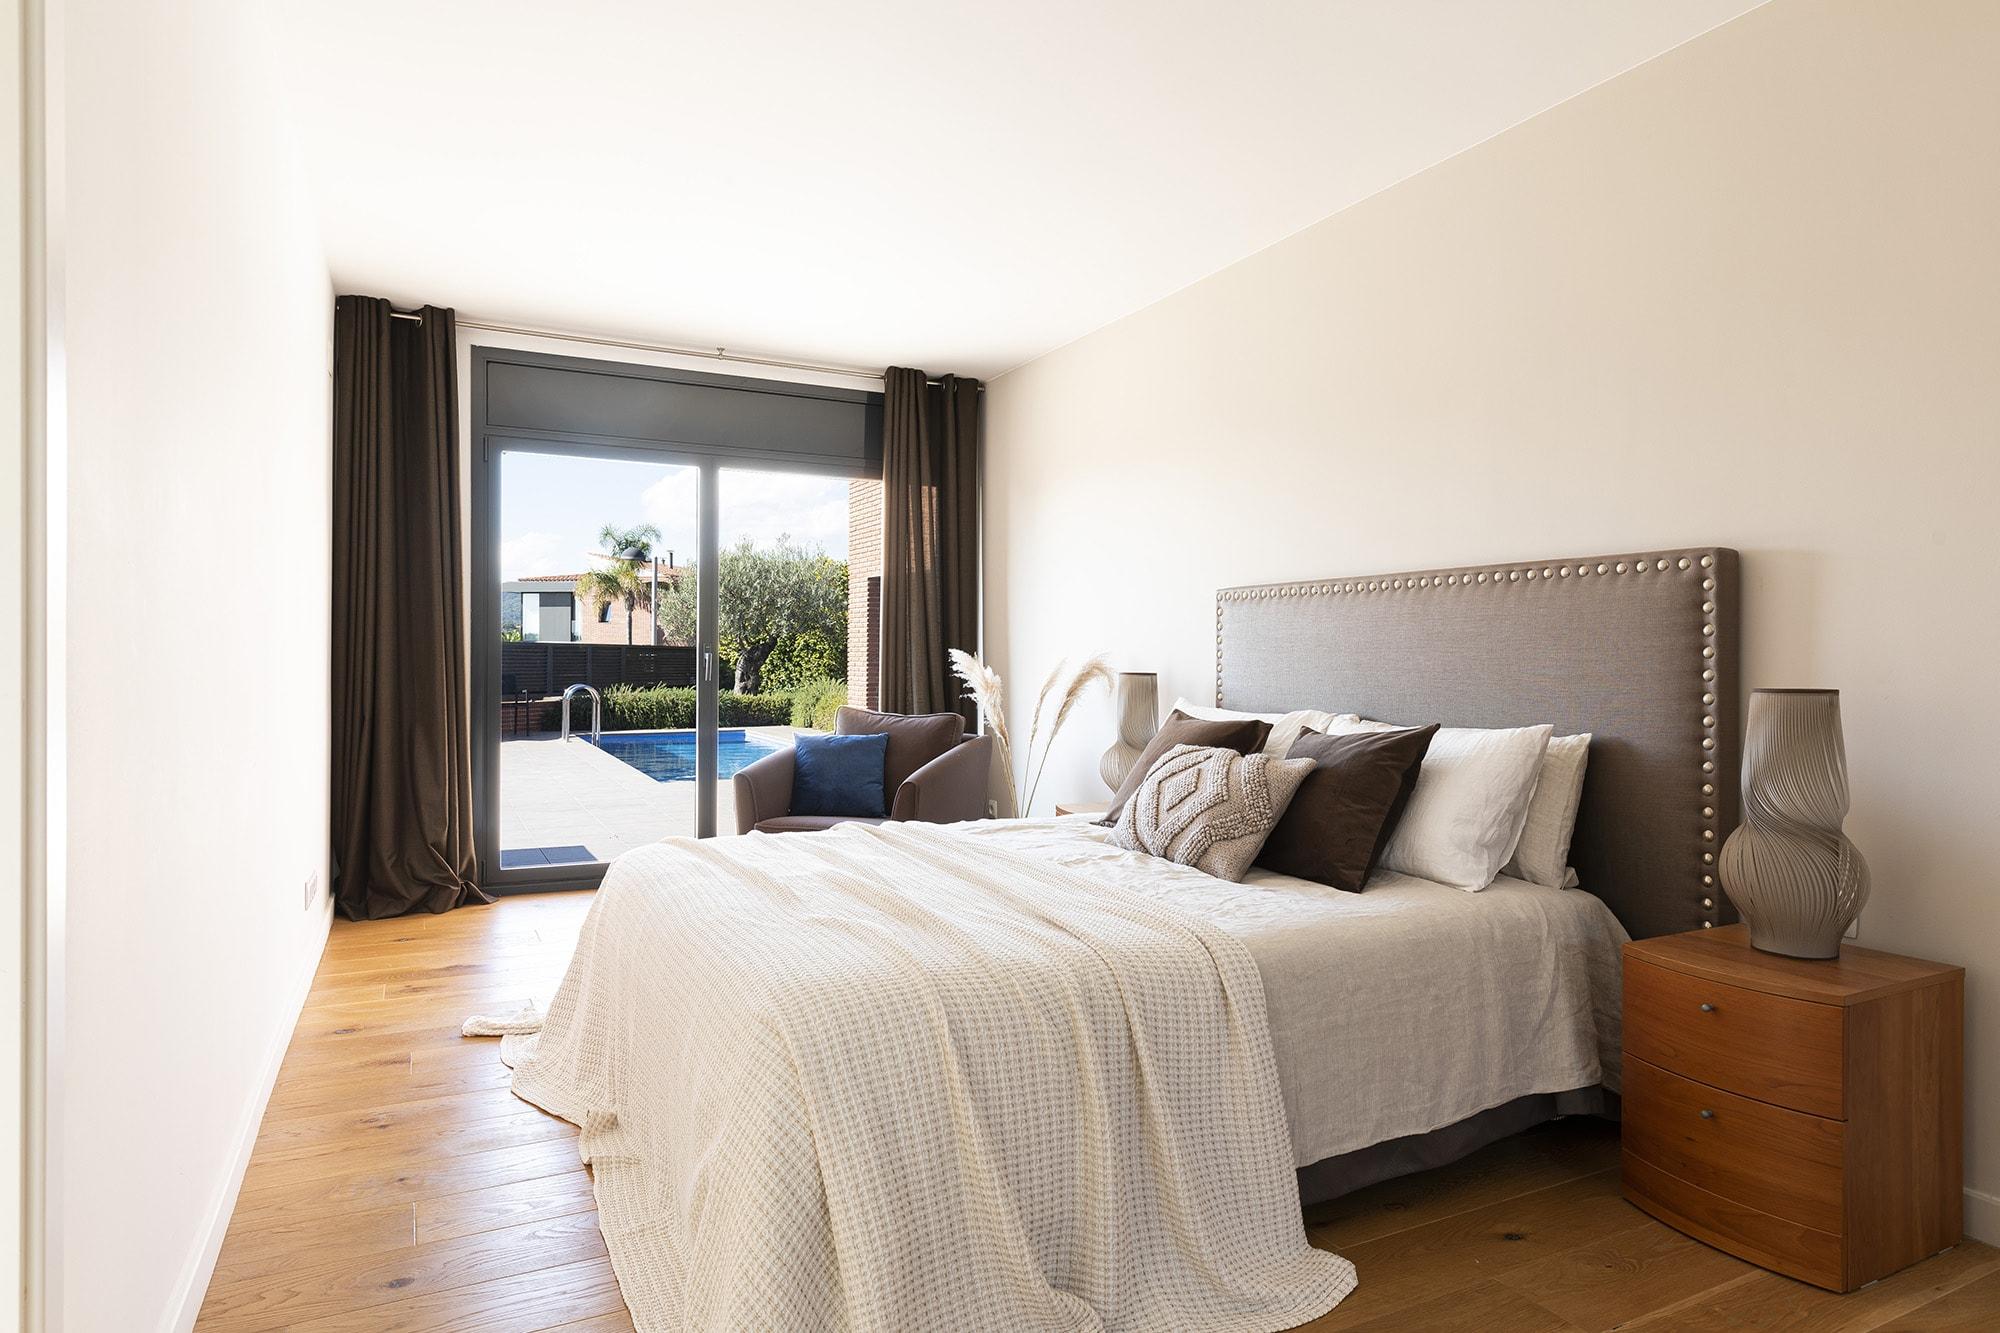 Villa for sale Caldes d'Estrac